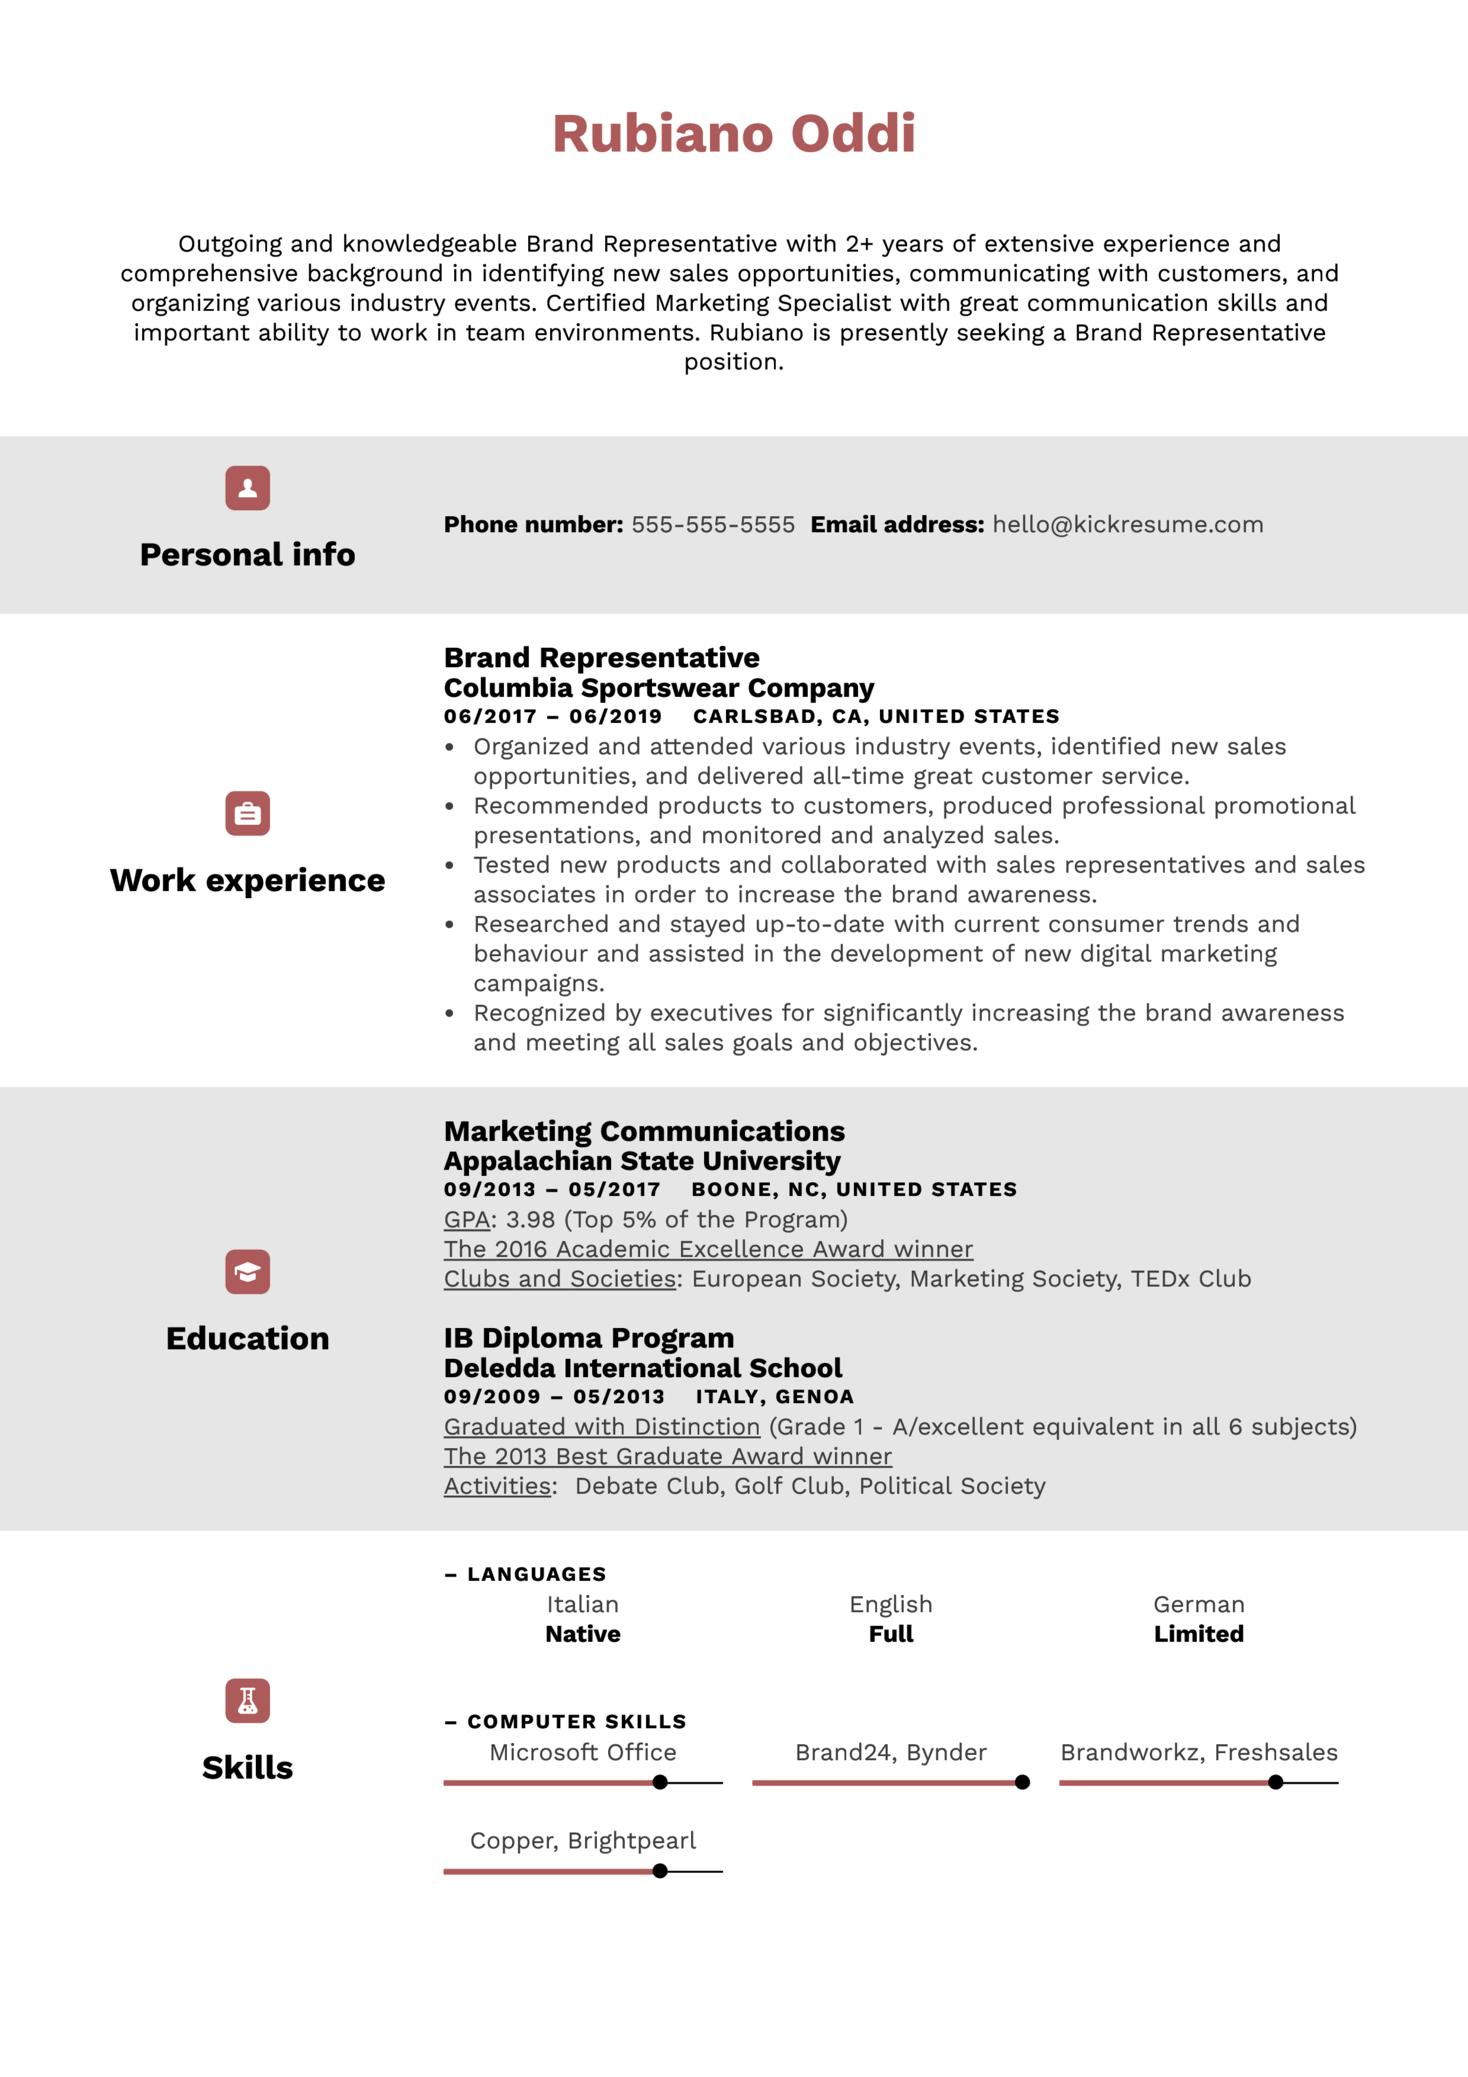 Brand Representative Resume Sample (Part 1)